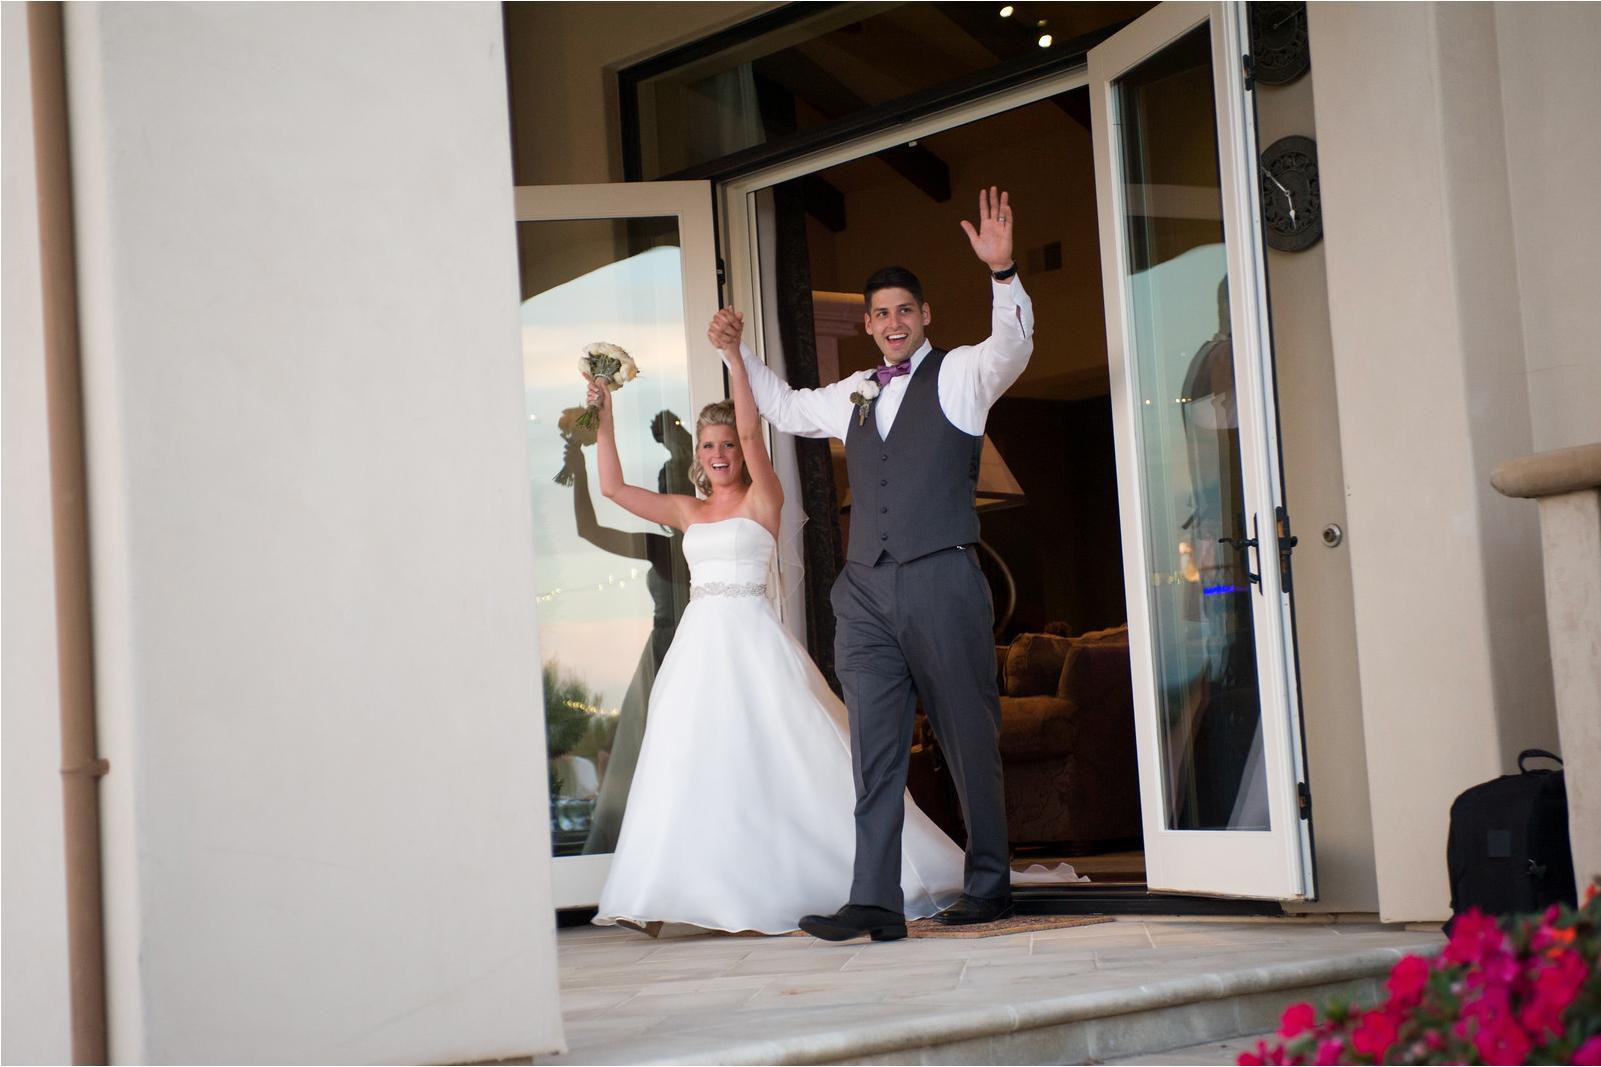 The Dream Wedding Reception Wedding Music By Michael